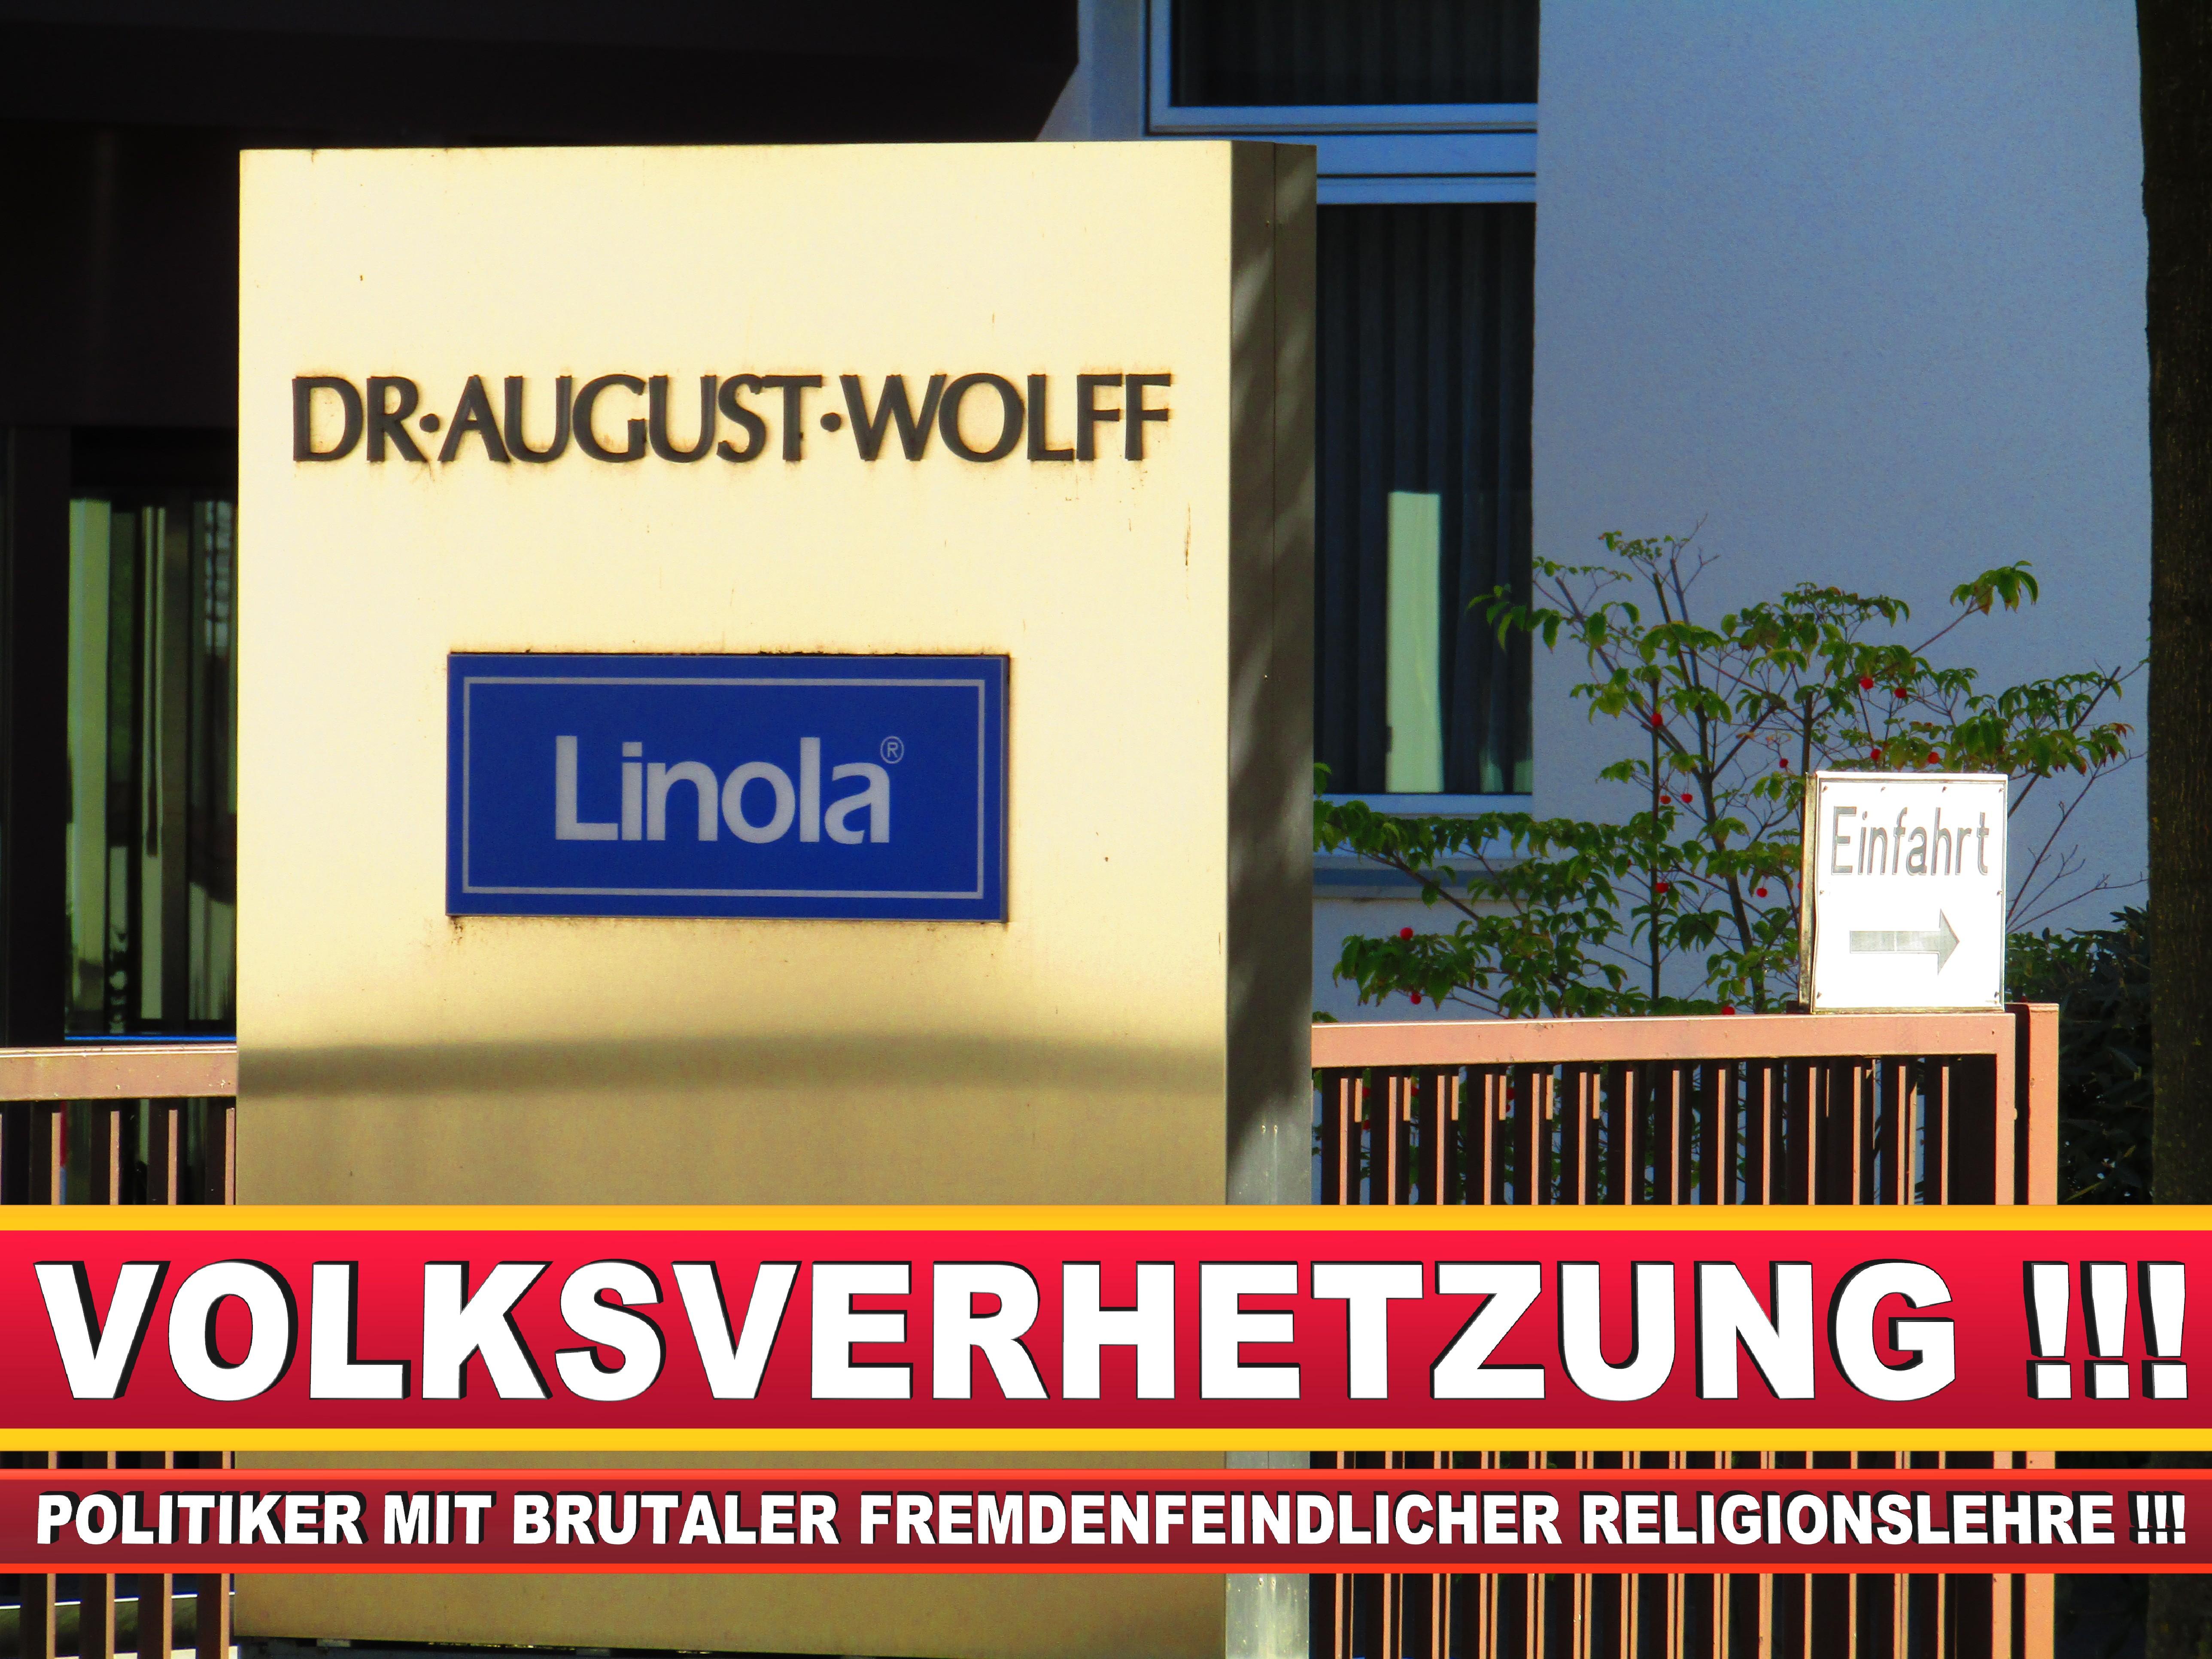 Dr August Wolff Linola CDU Bielefeld NRW OWL (6)